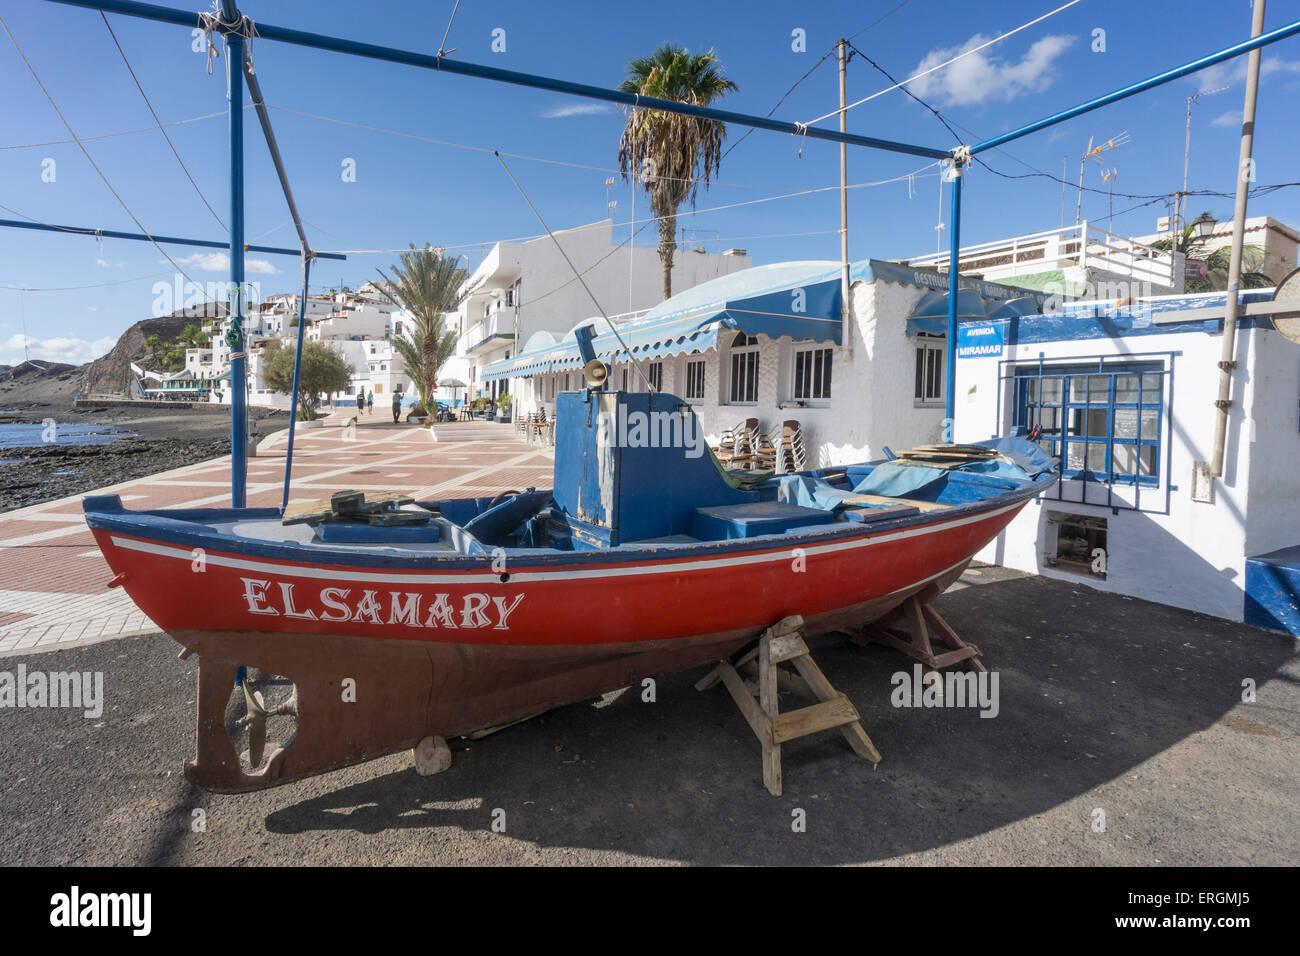 Las Playitas, Fisher Boat, Promenade, Fuerteventura, Canary Islands, Spain, Europe, - Stock Image